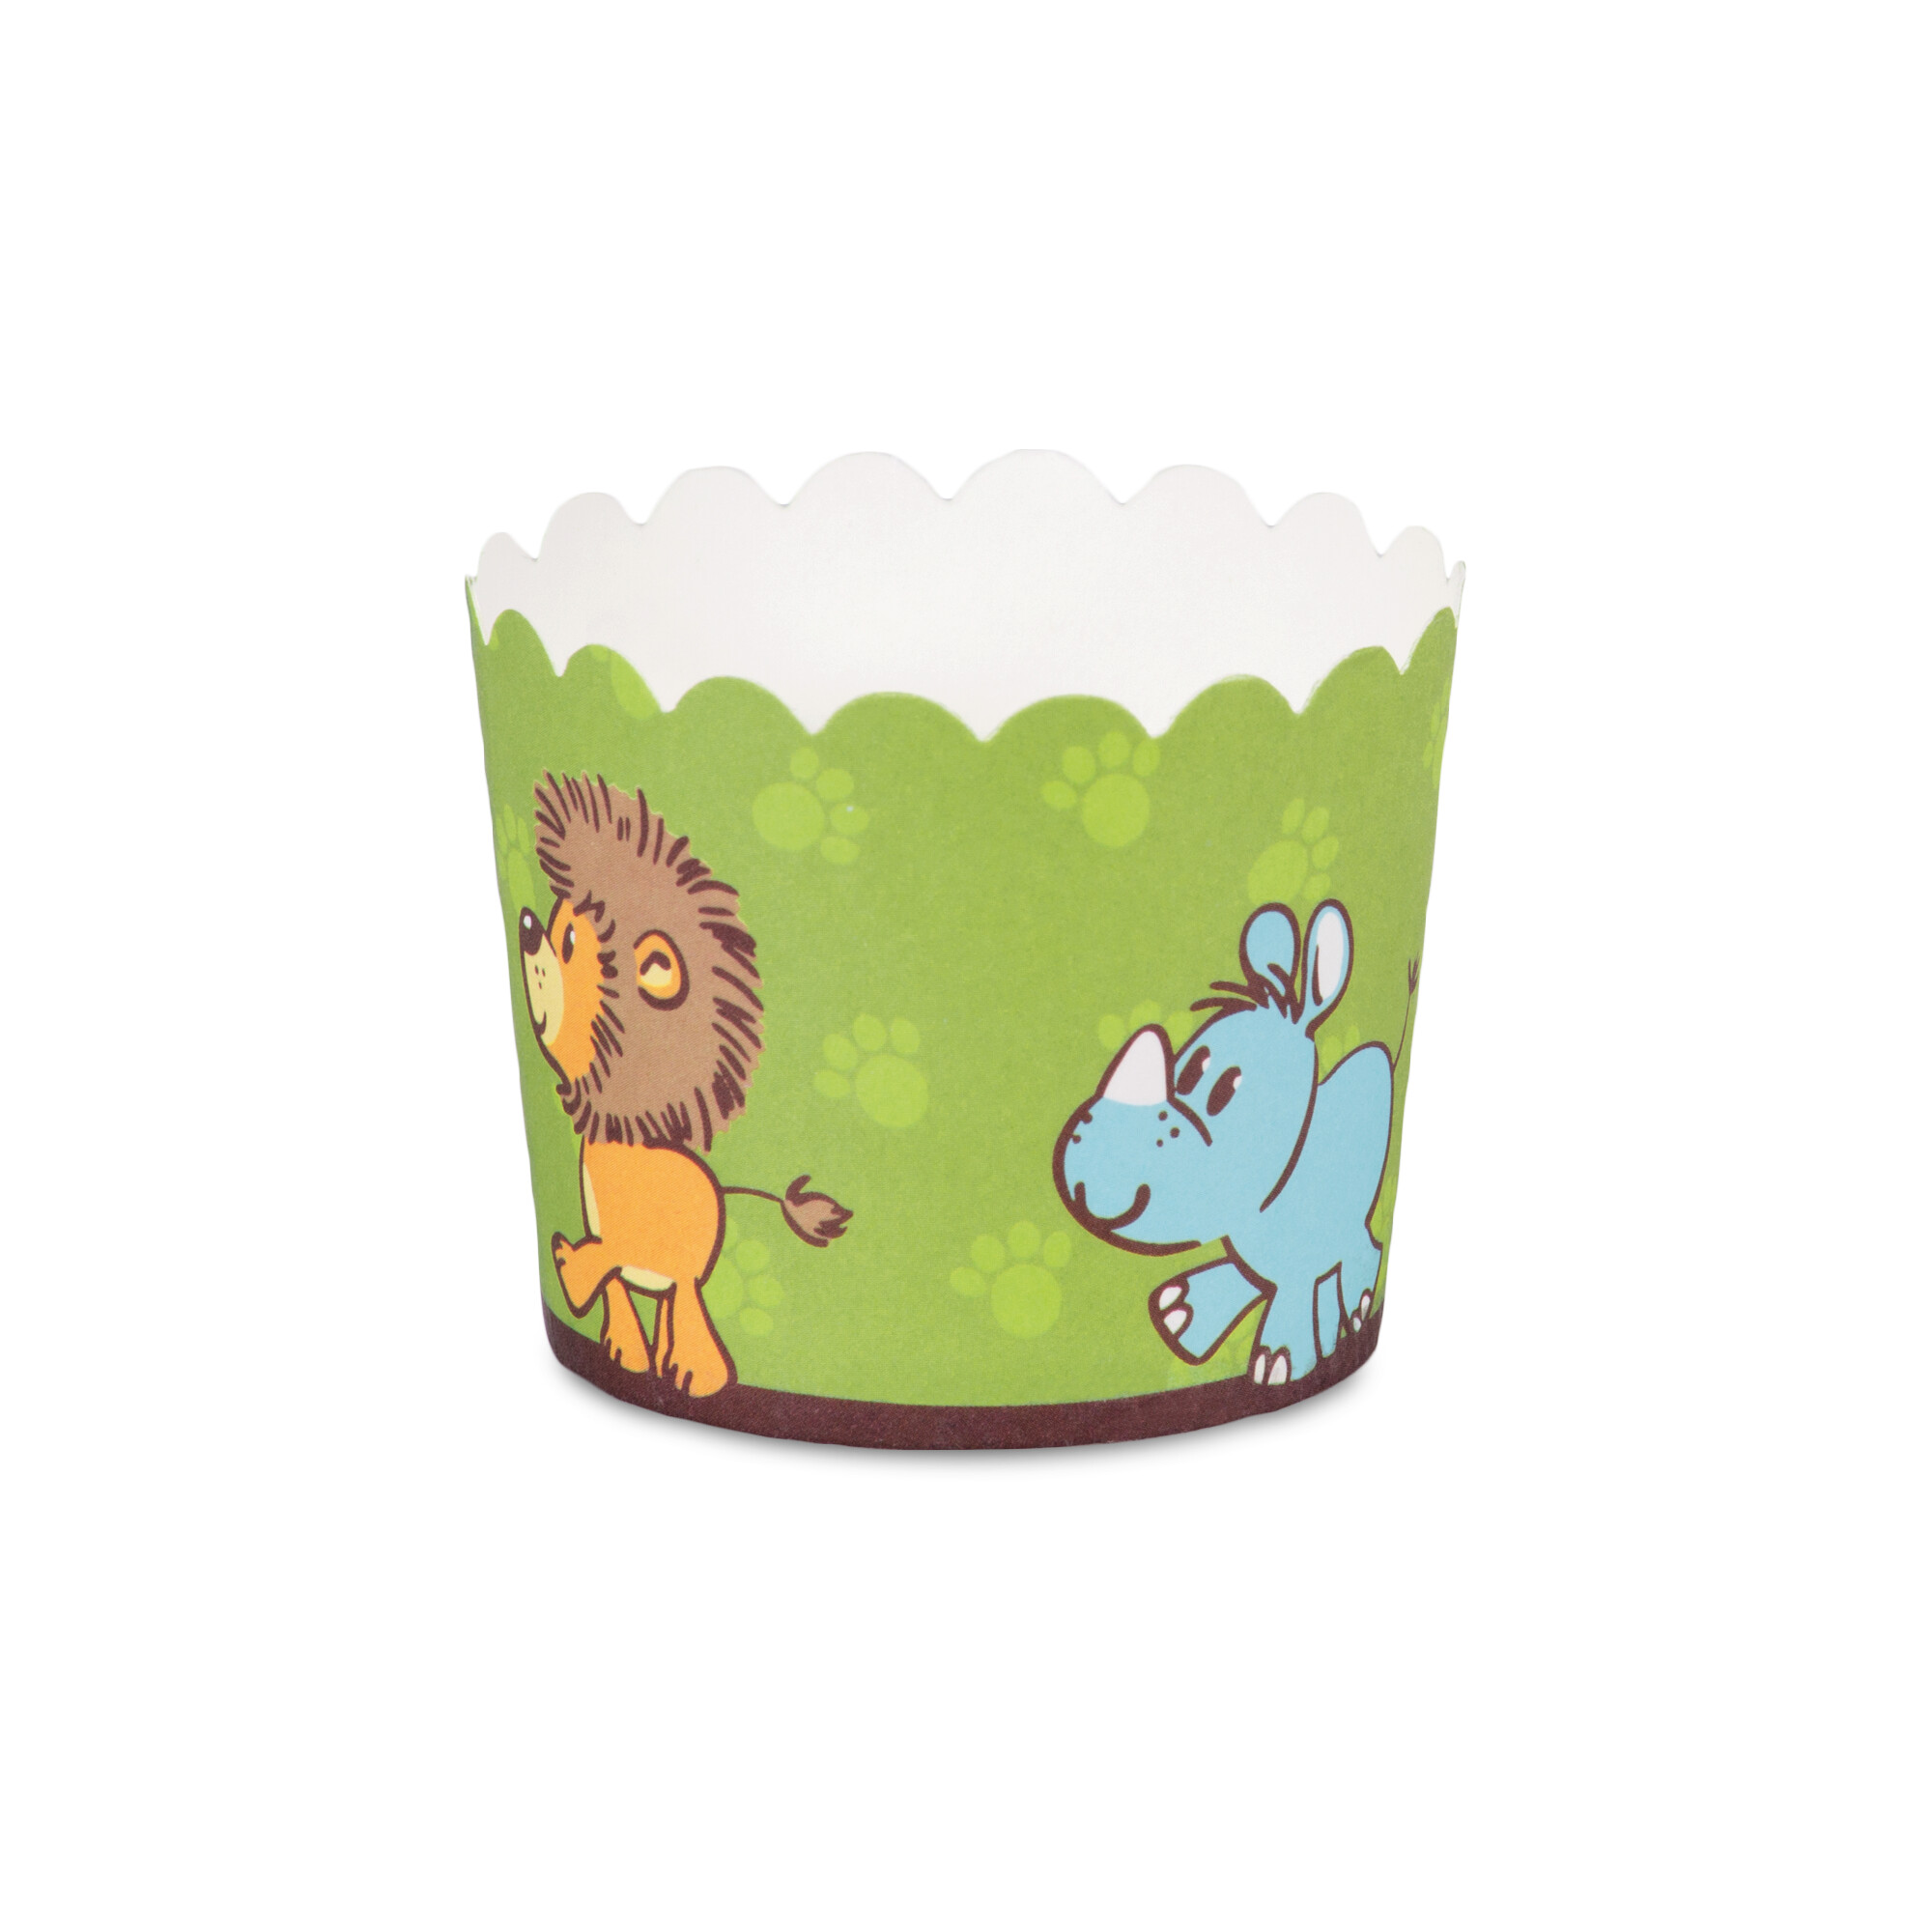 Cupcake liner - True friends - Mini - 12 pieces